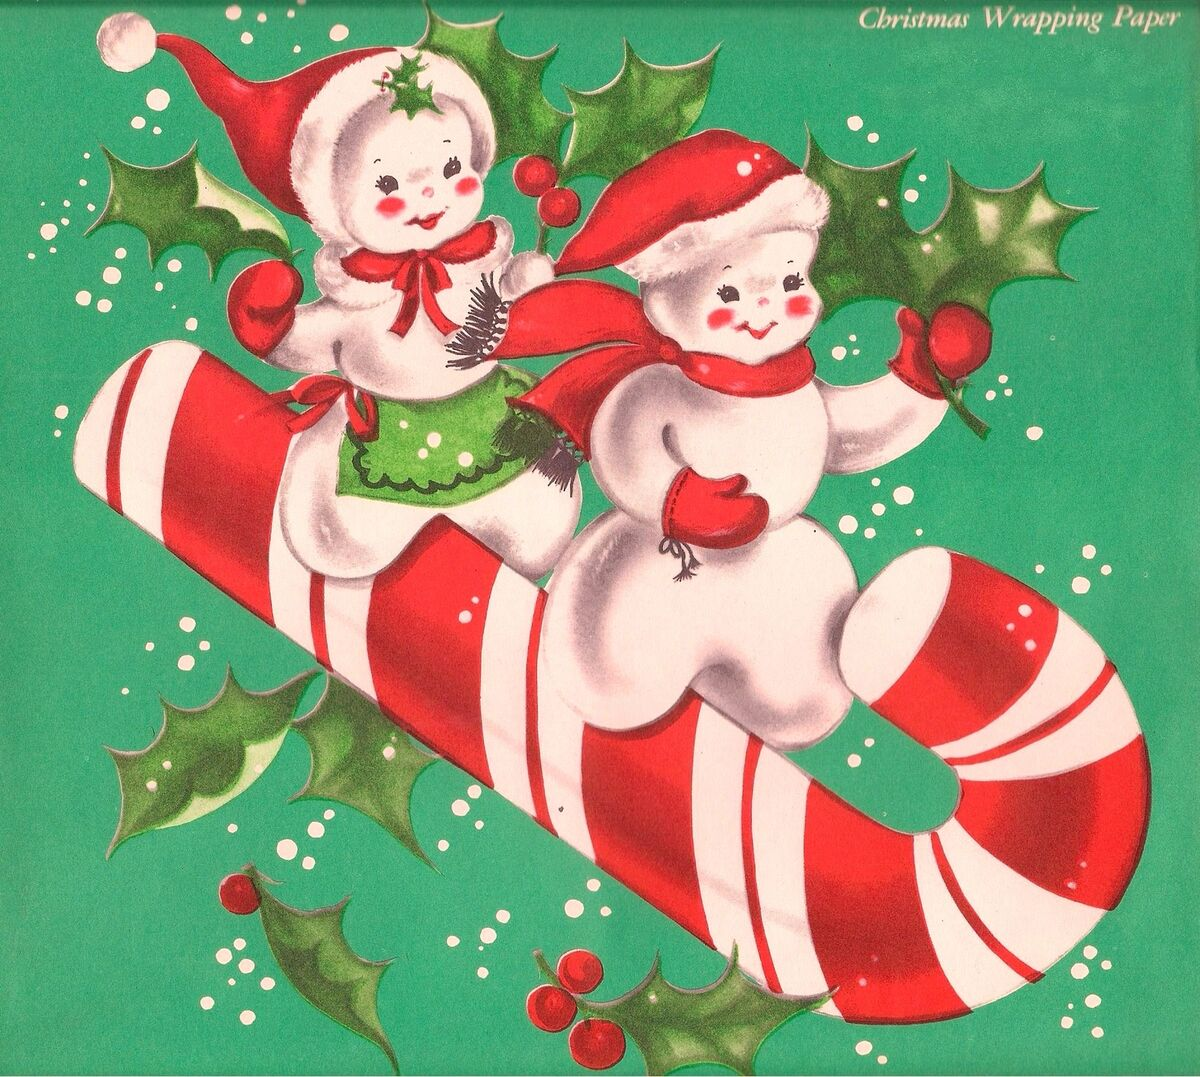 Tim's Christmastide